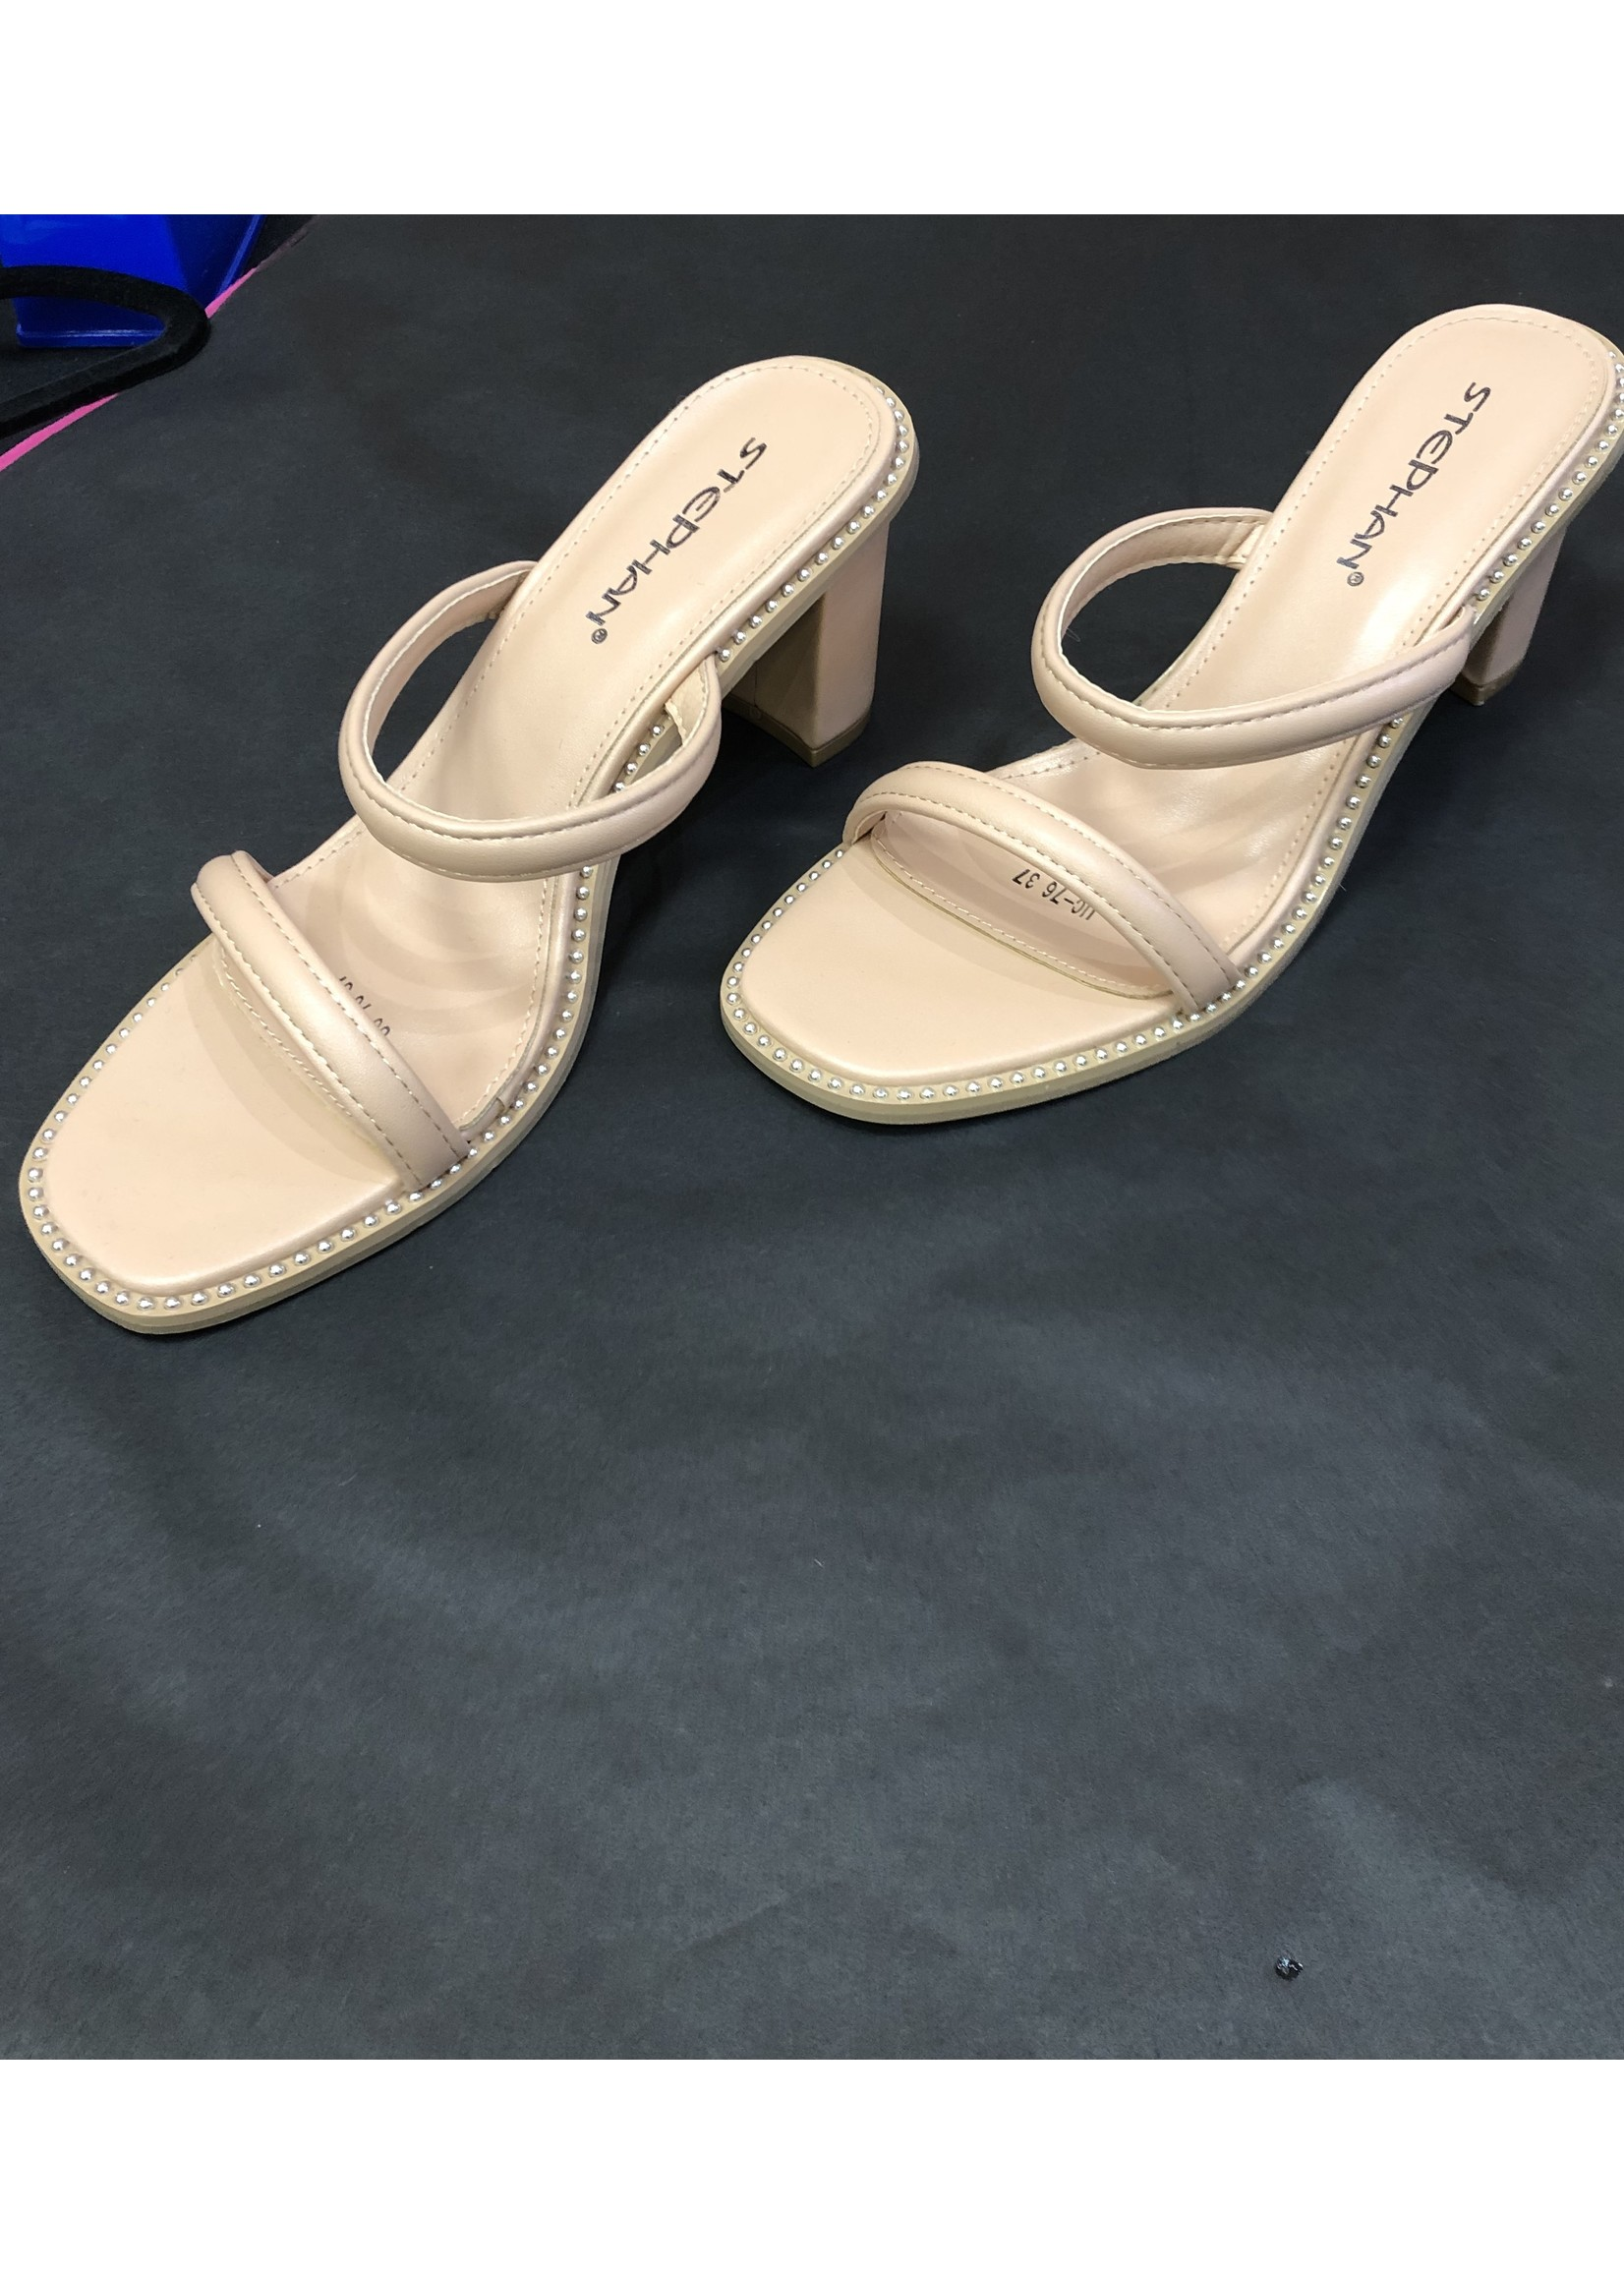 Zoe sandal